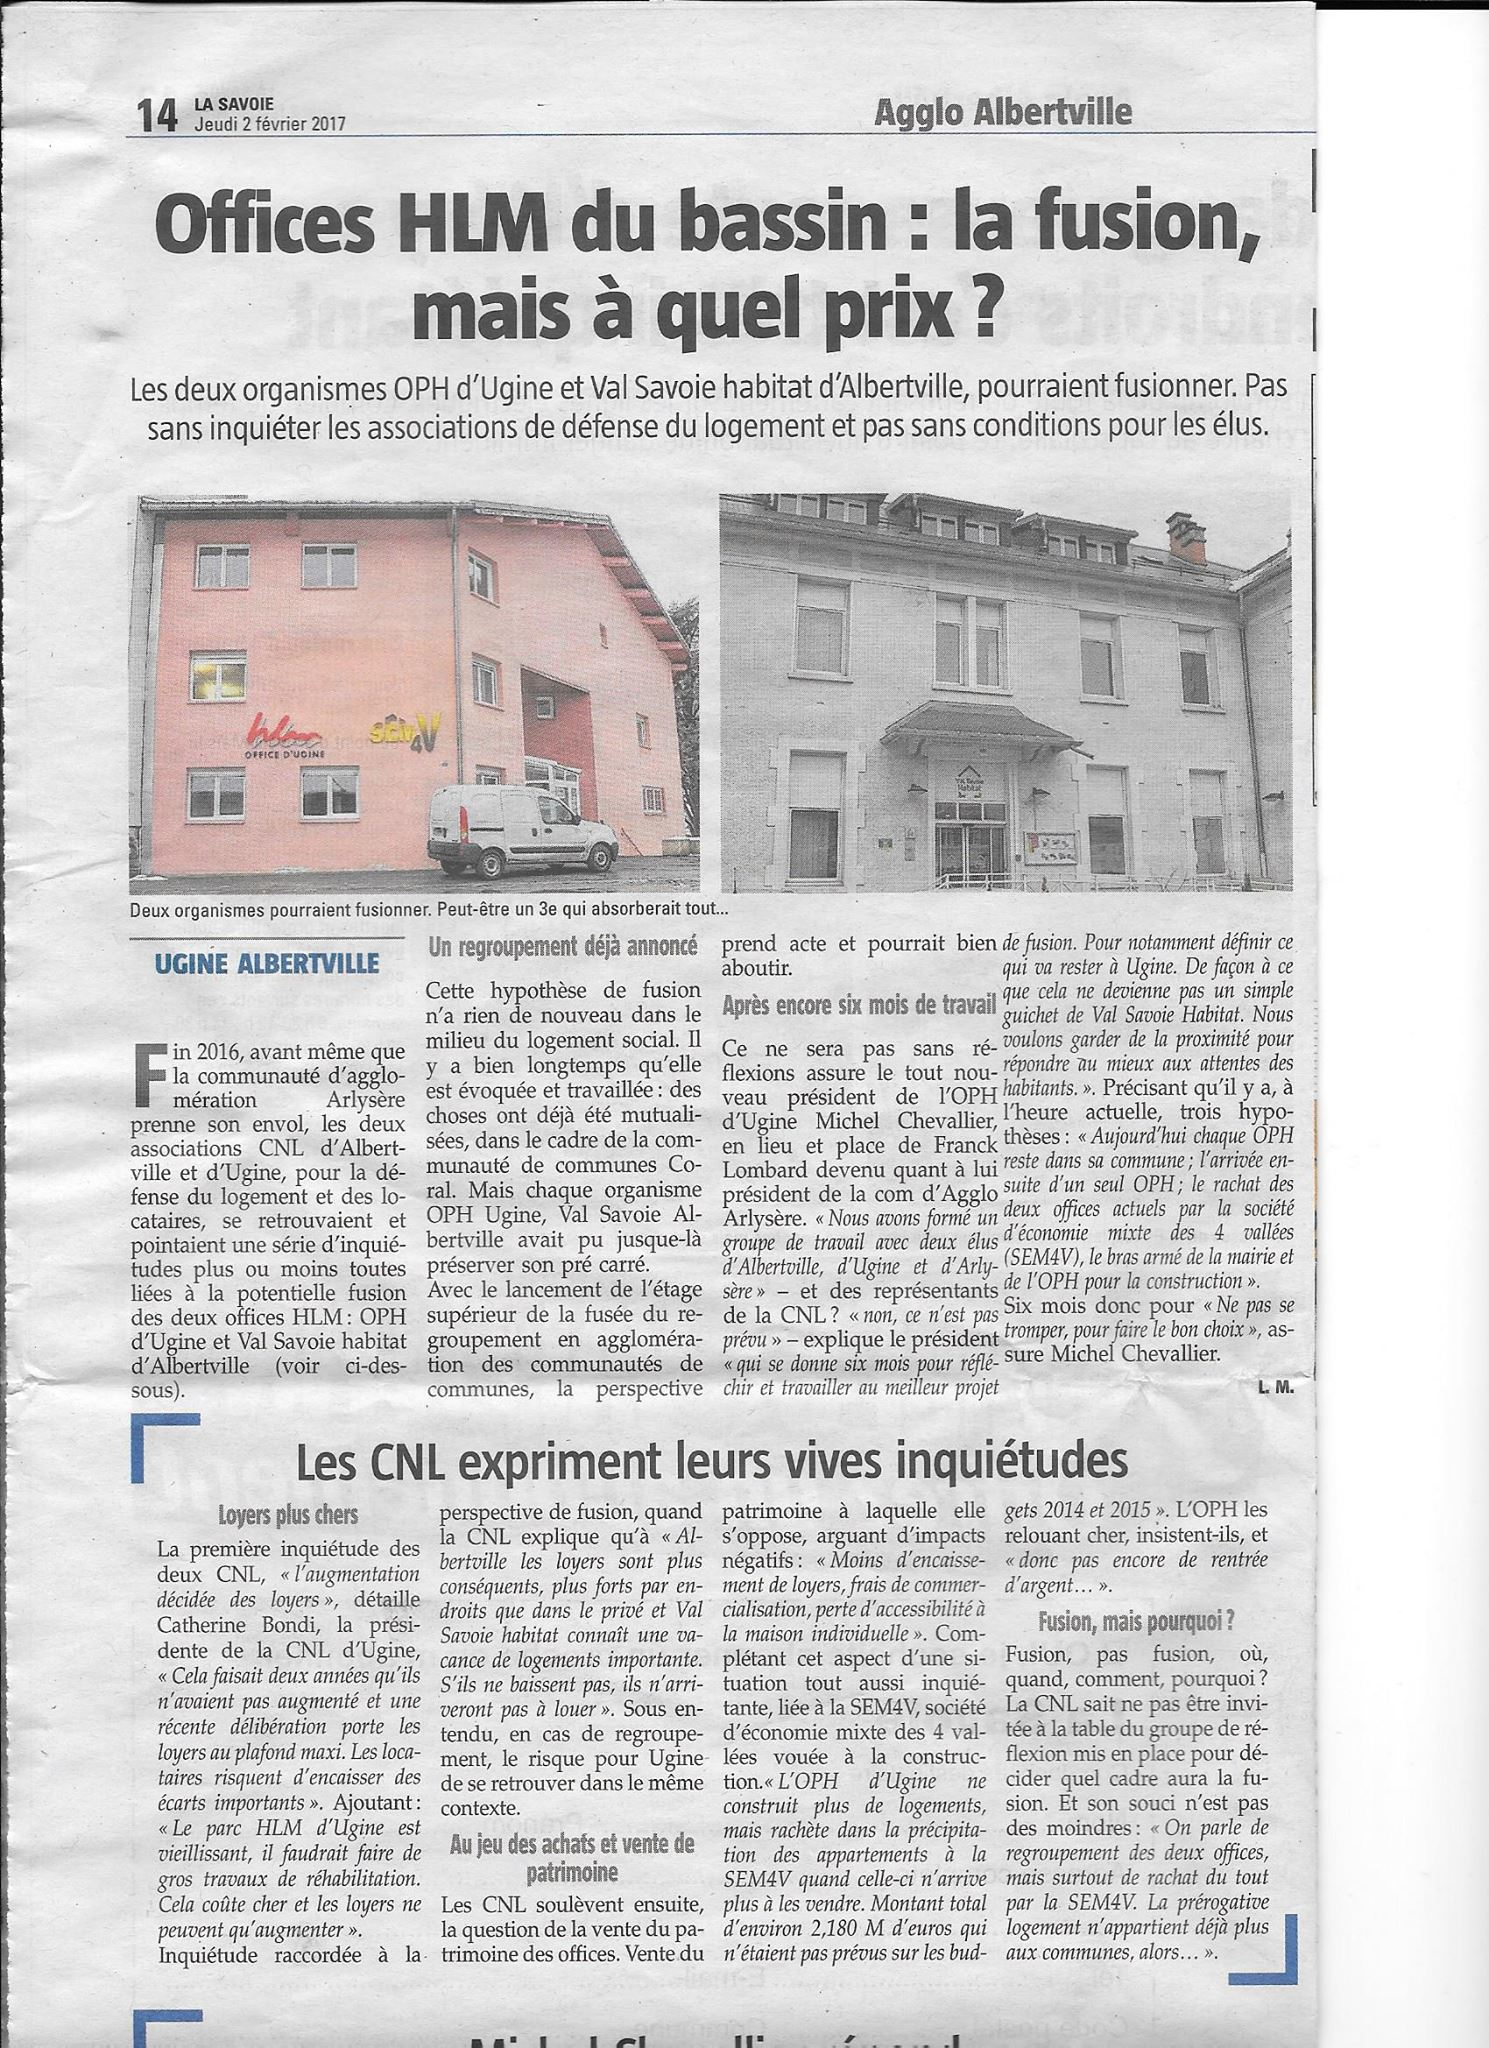 0213_article fusions OPH ugine et albertville_1